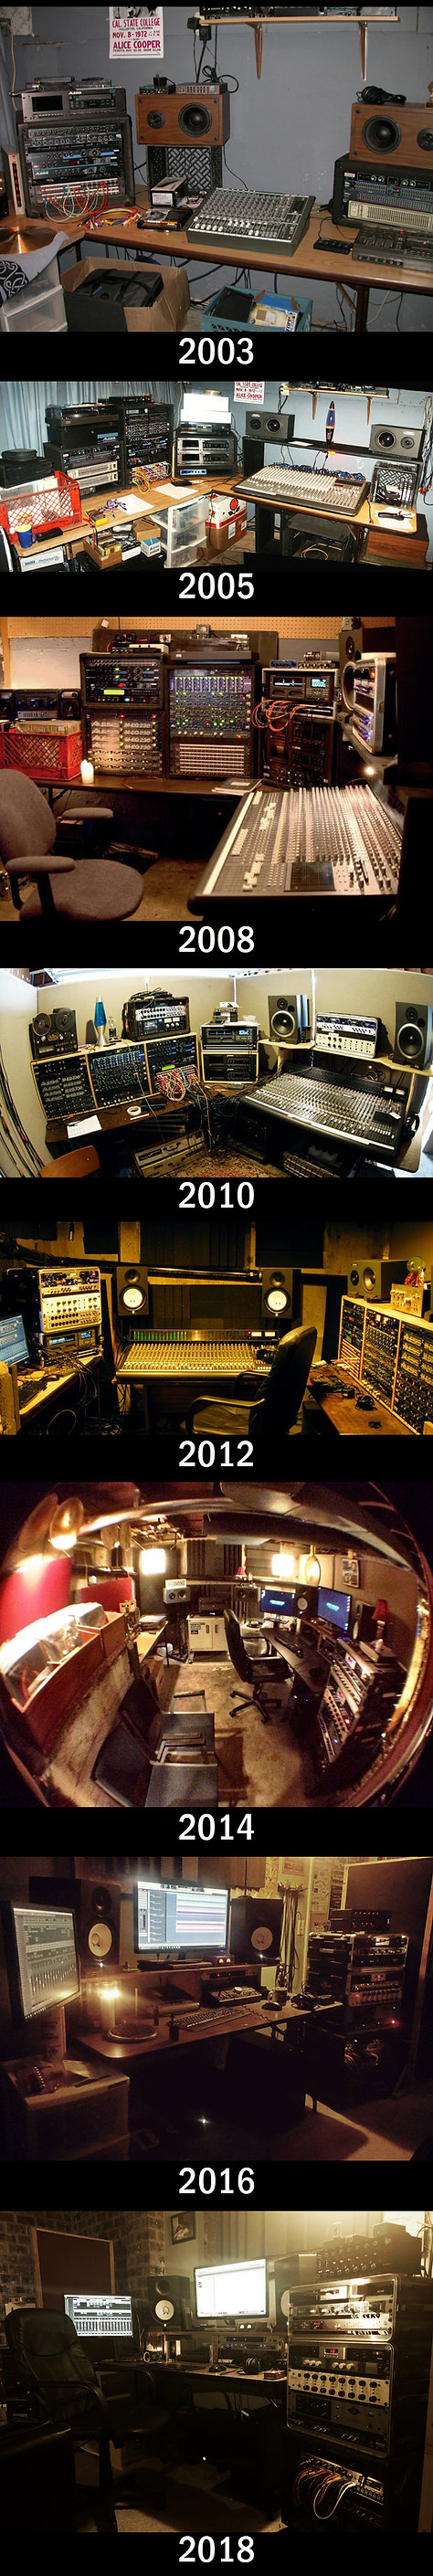 Studio history.jpg